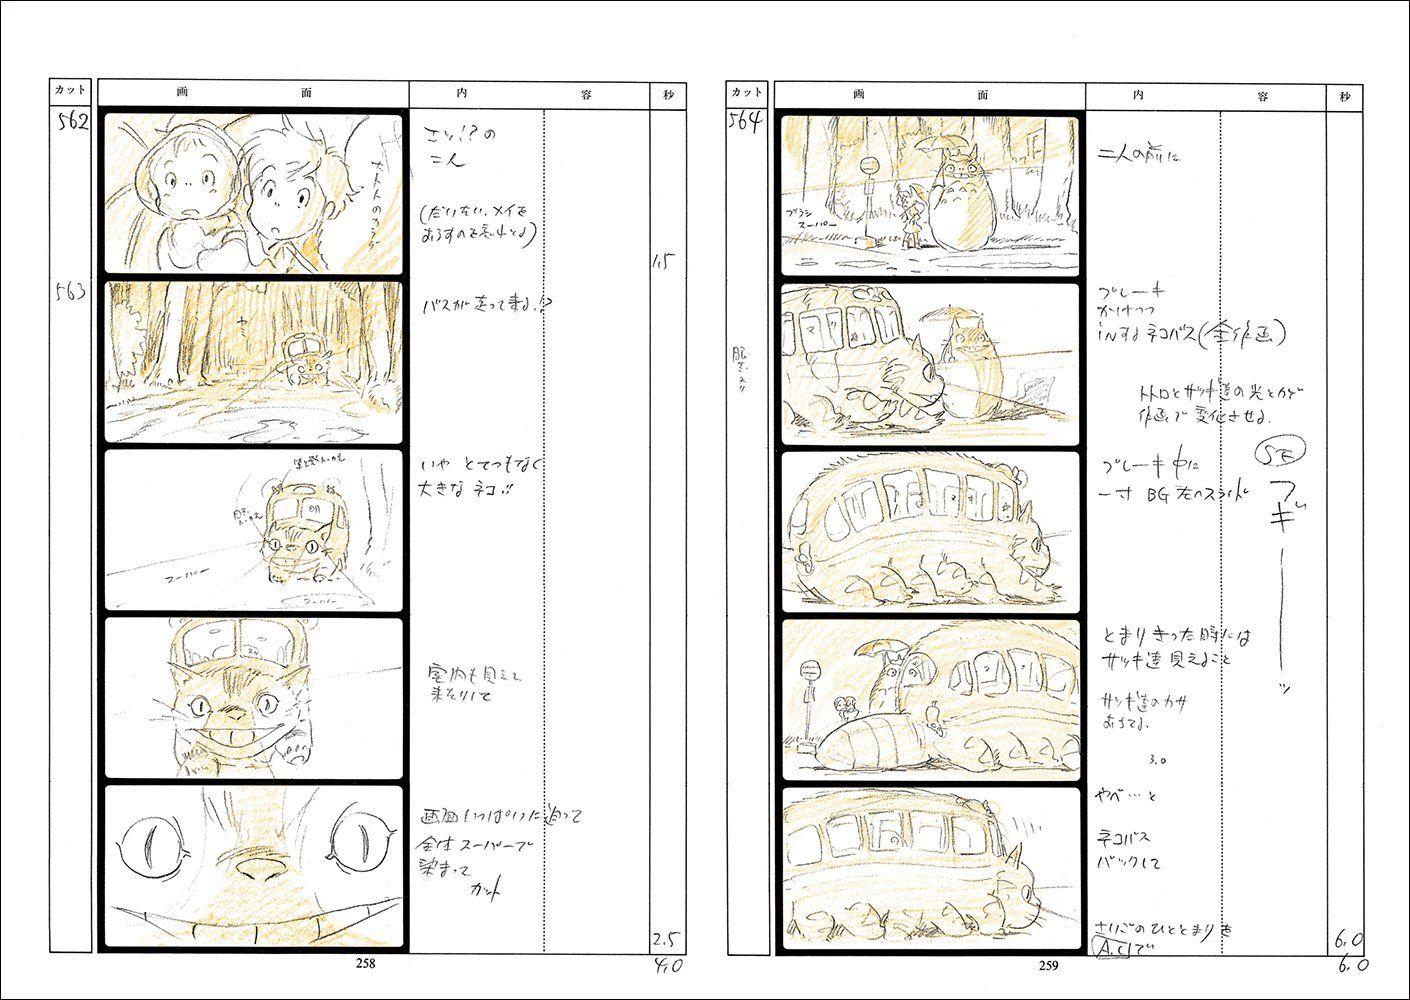 Used Anime Art Book Studio Ghibli Layout Design Exhibition Hayao Miyazaki 2008